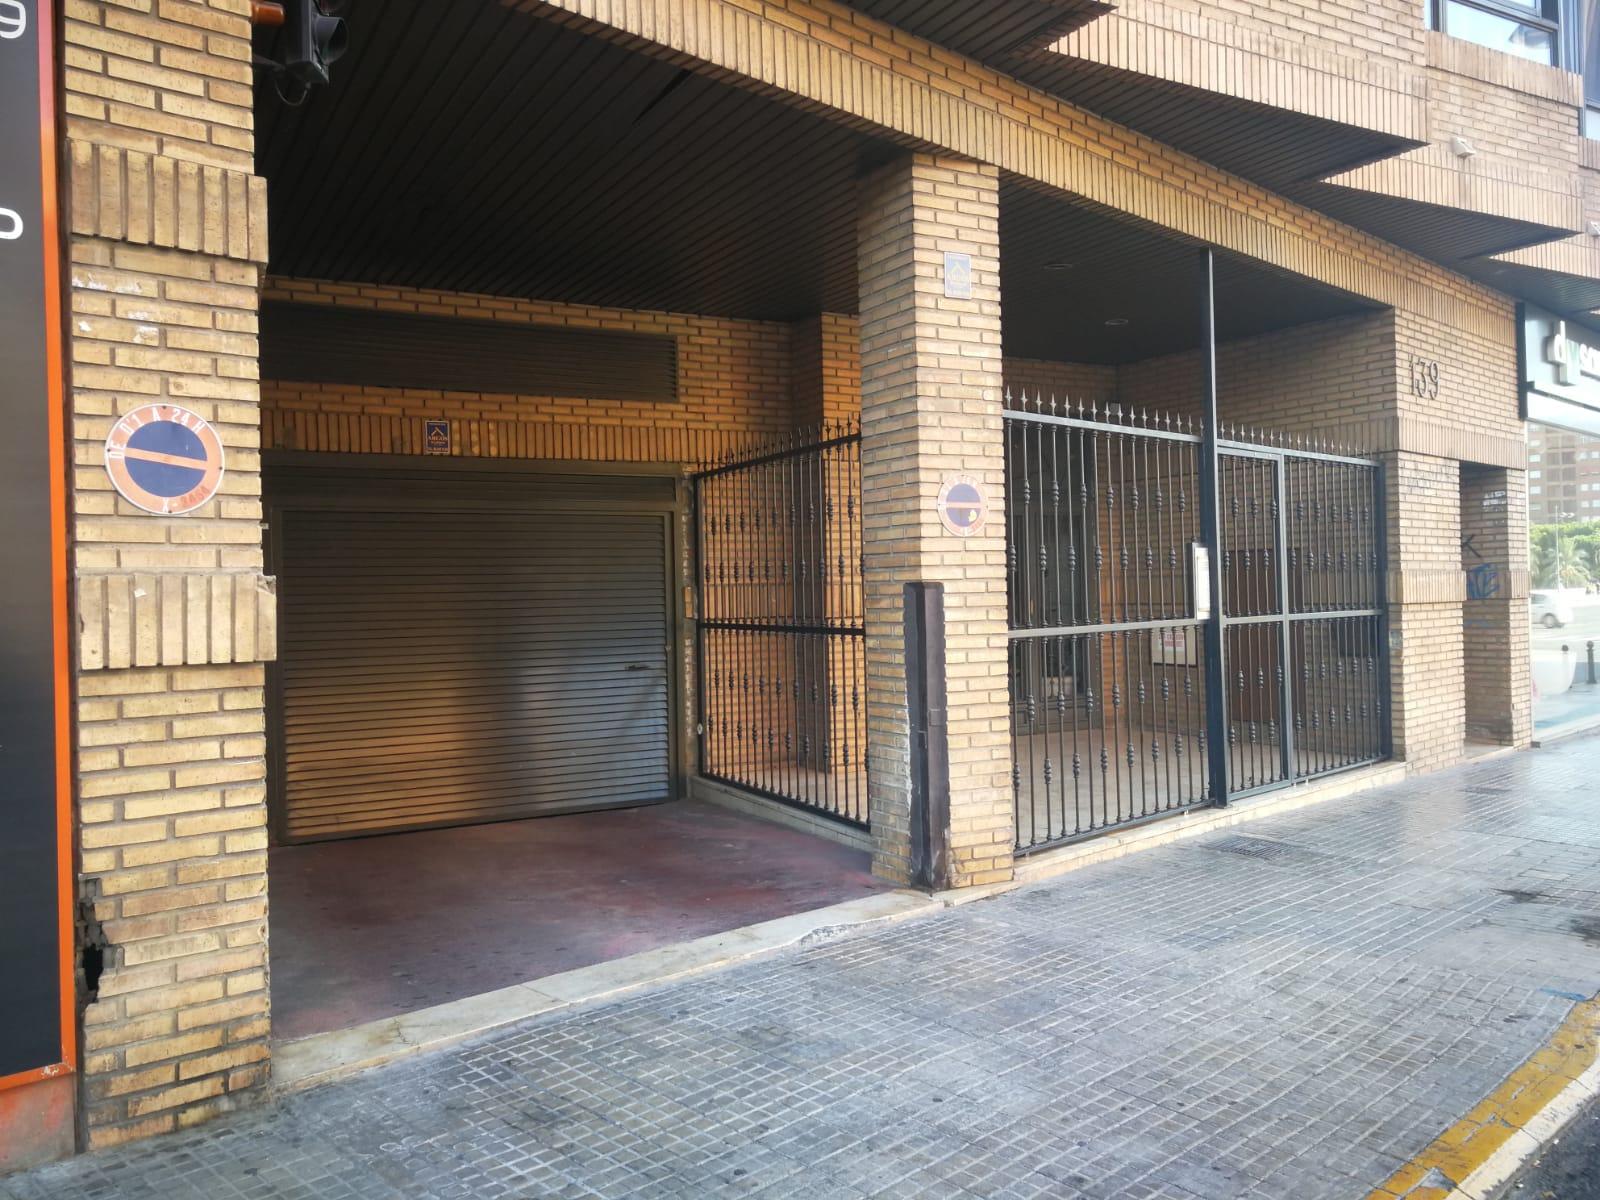 Aparcamiento   garaje   caja 4 m²